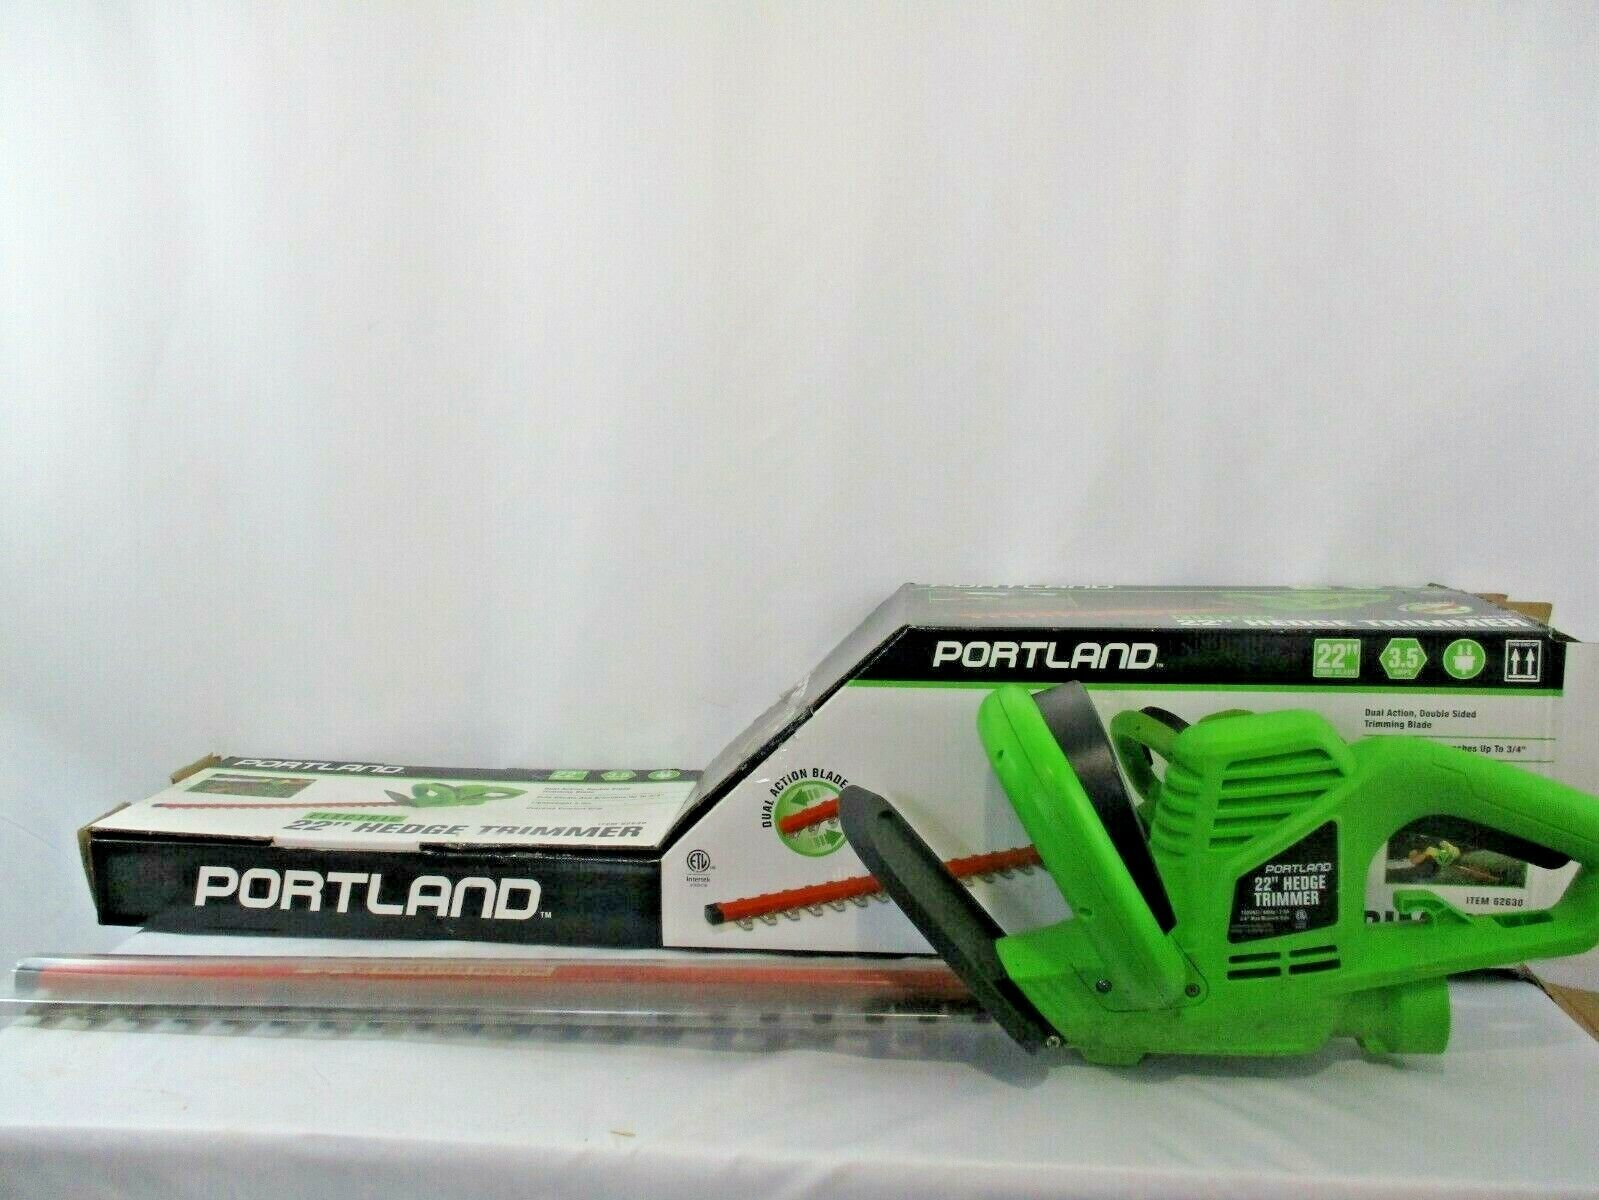 Portland Electric 22'' Hedge Trimmer